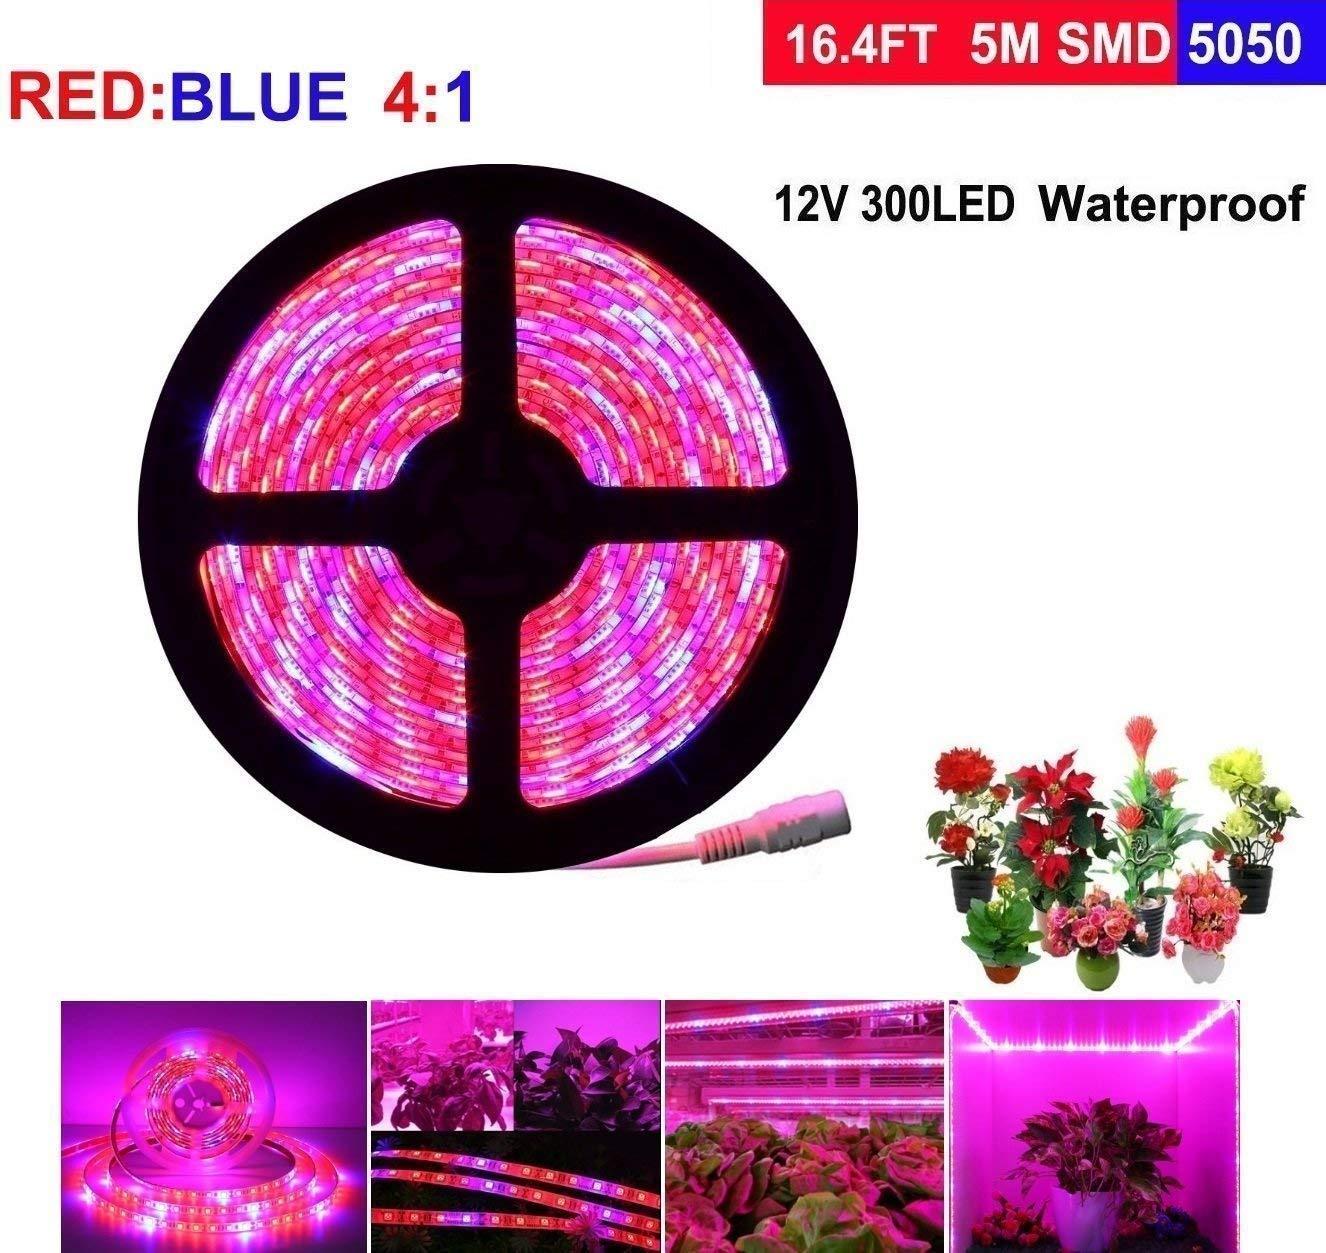 LEHOU LED Plant Grow Light, 5M/16.4ft LED Strip Lights, Waterproof Full Spectrum Red Blue 4:1 Rope Lights for Aquarium Greenhouse Hydroponic Plant, Garden Flowers Veg Grow Lights